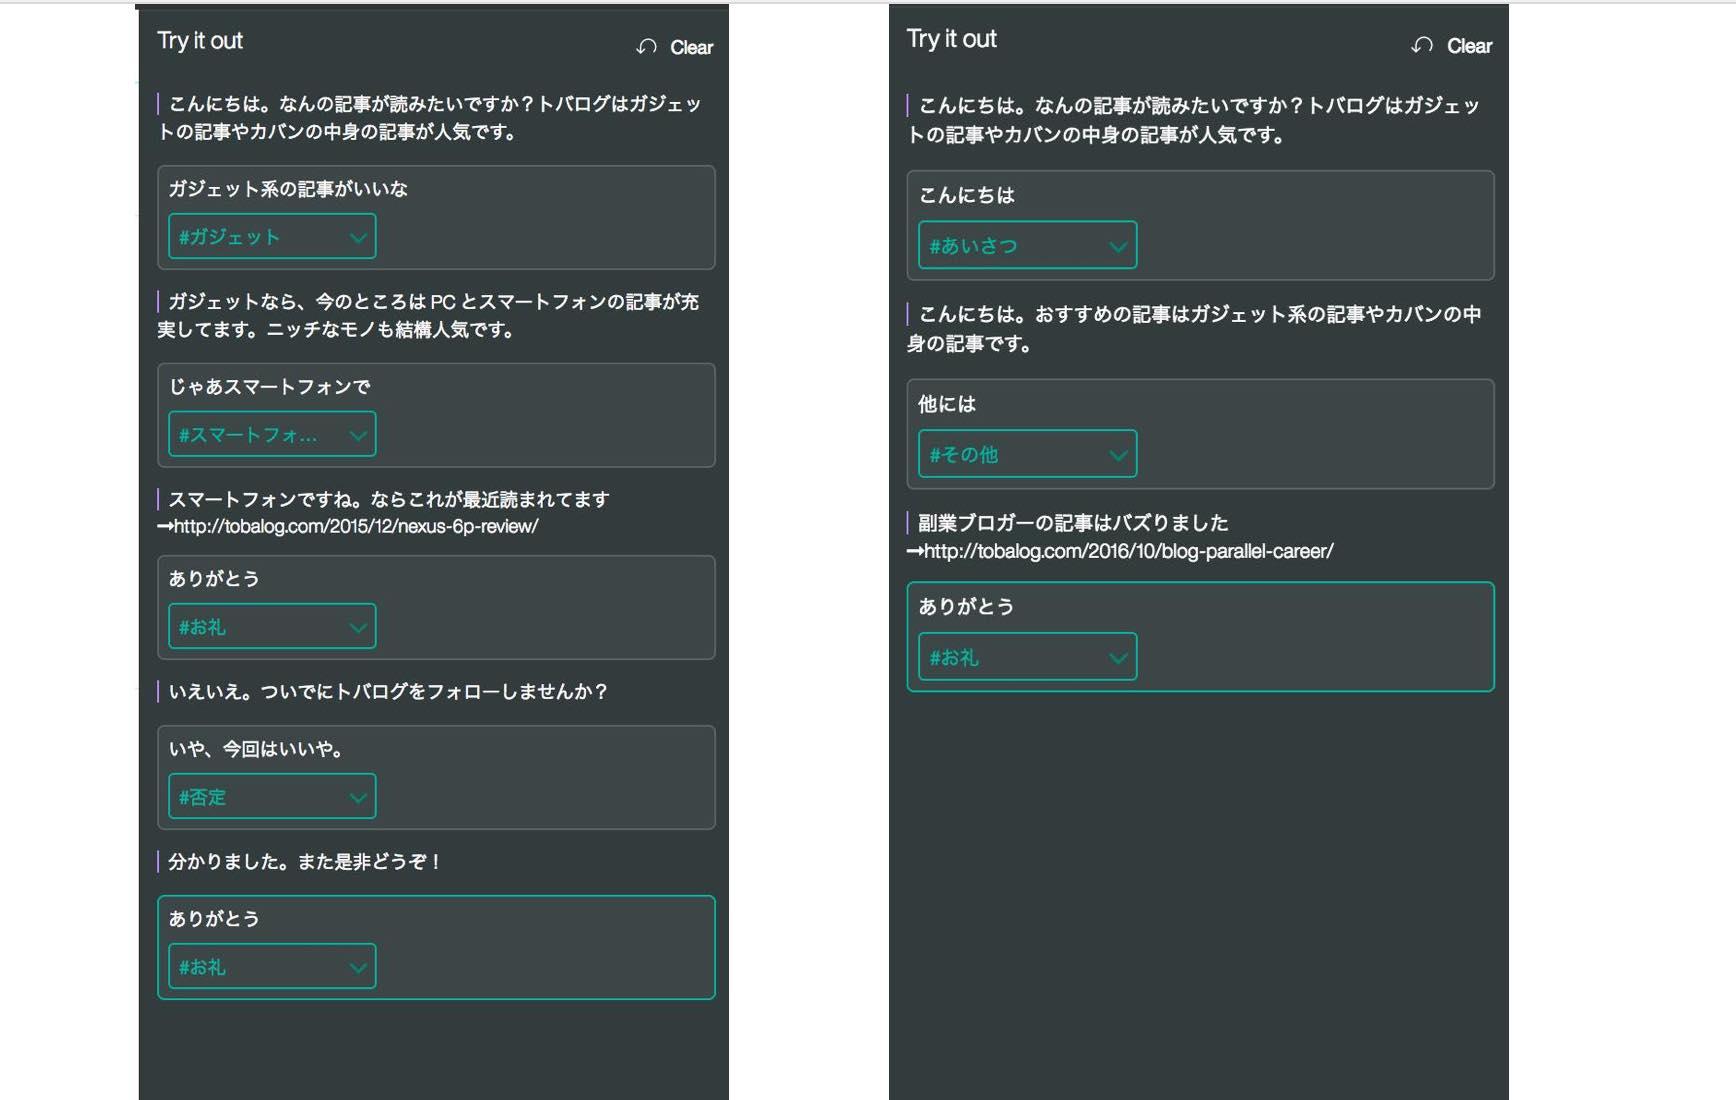 th_chatbot-conversation-1-ibm-think-watson20